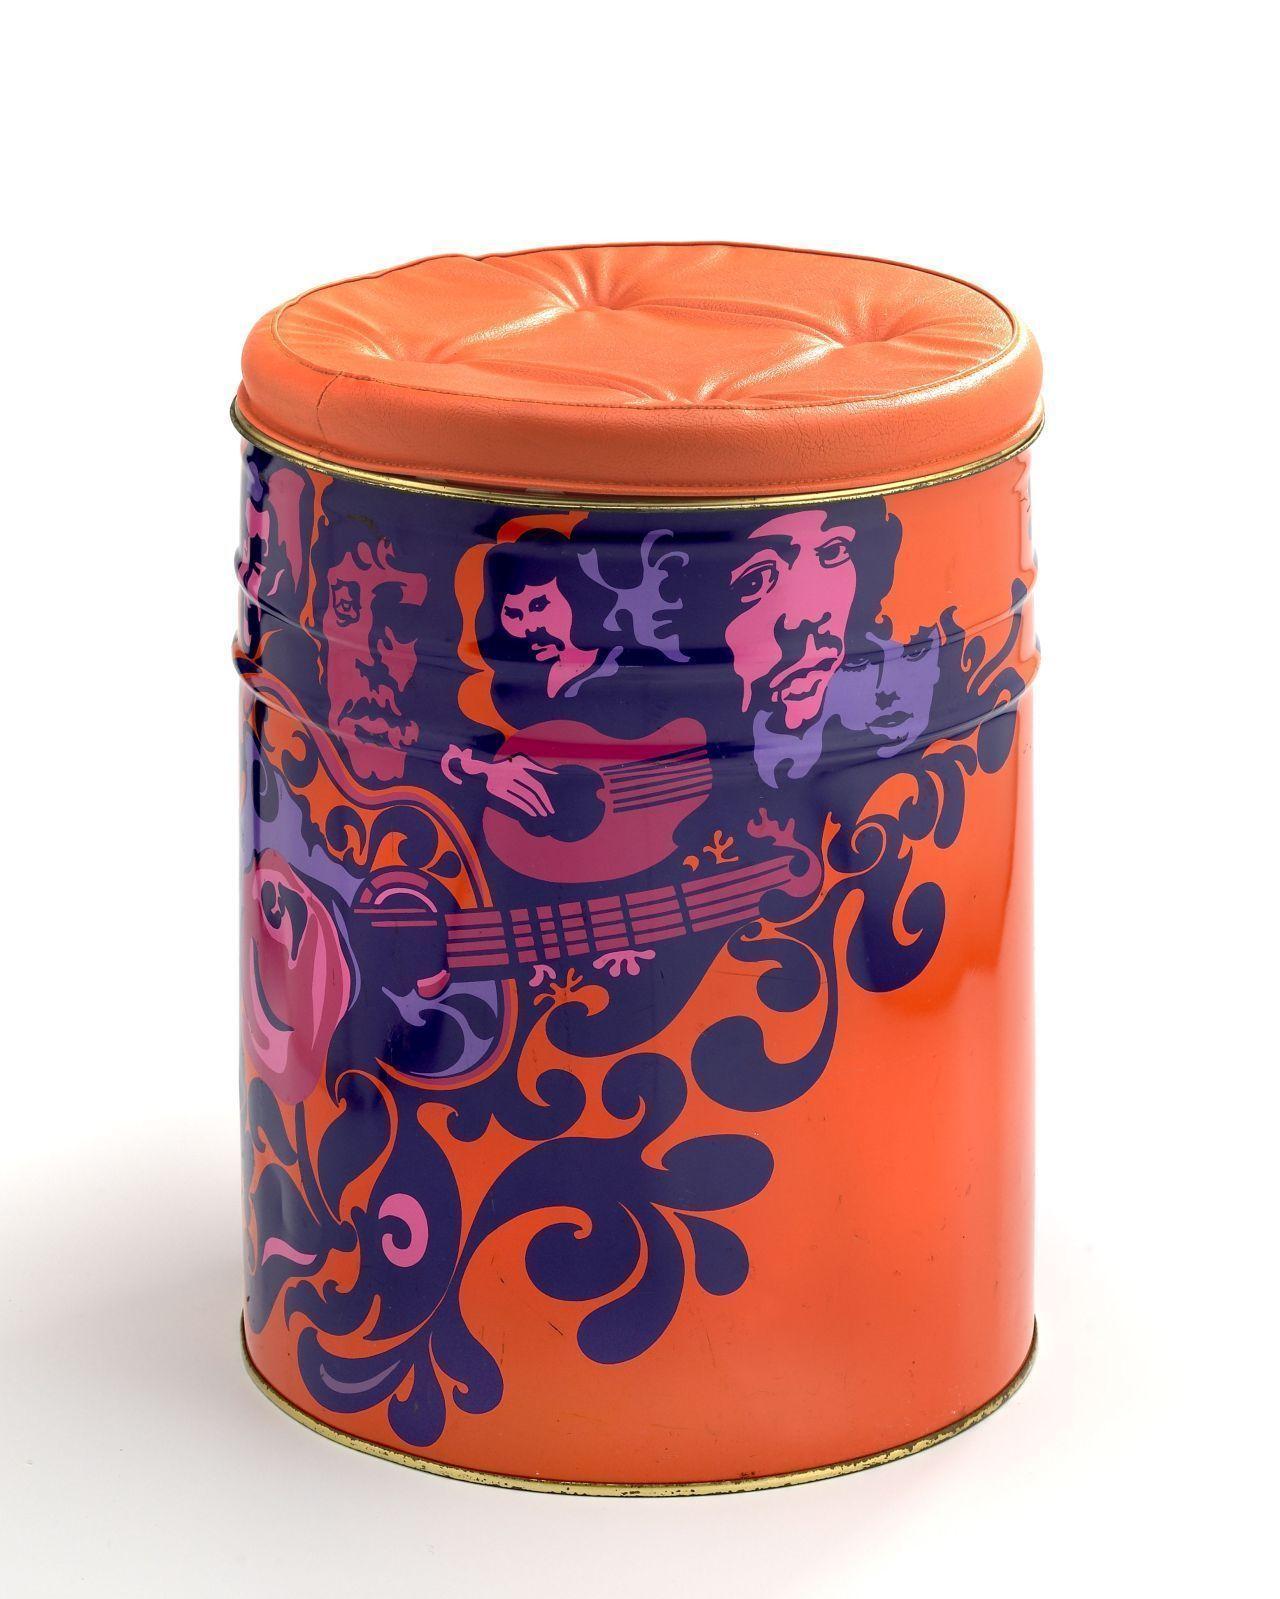 Orangefarbene Partytonne mit Jimi-Hendrix-Abbildung